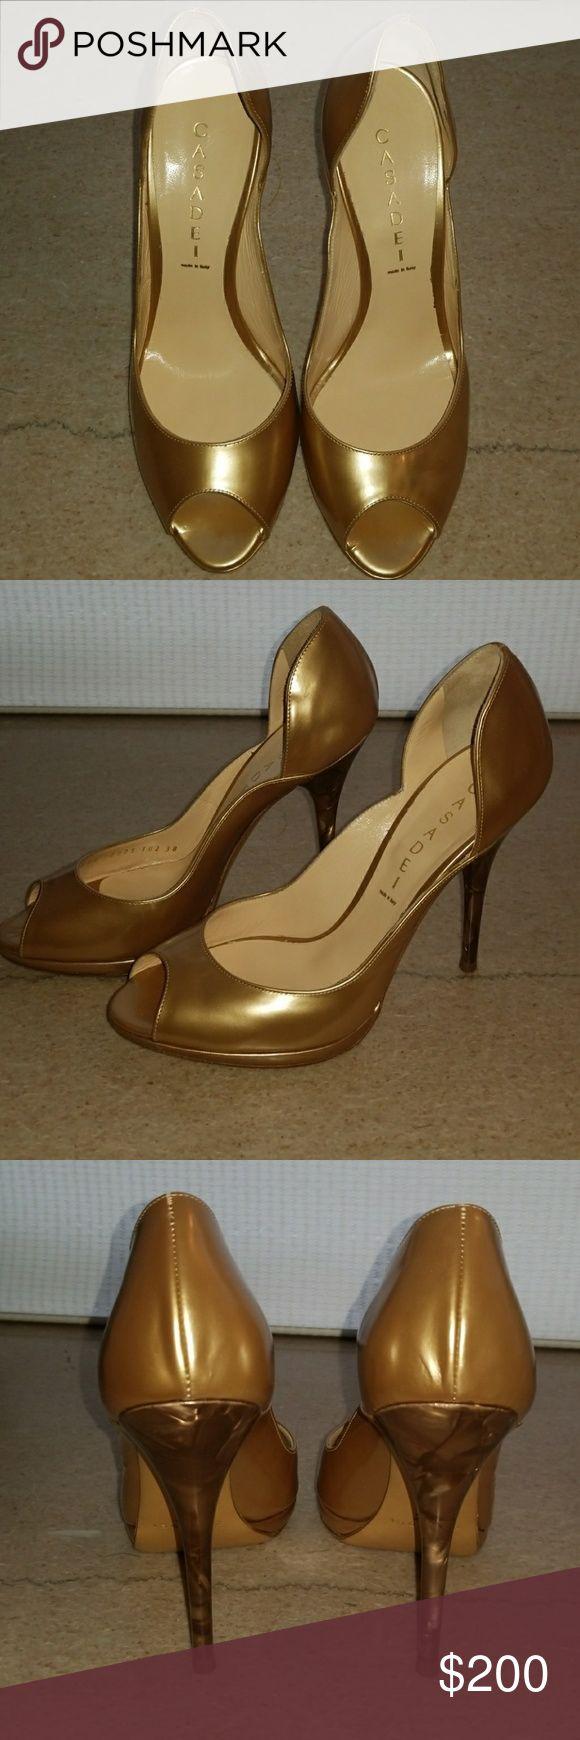 Casadei peep toe heels Beautiful gold peep toe heels with goregous marbled detailed heel. Never worn. Casadei Shoes Heels